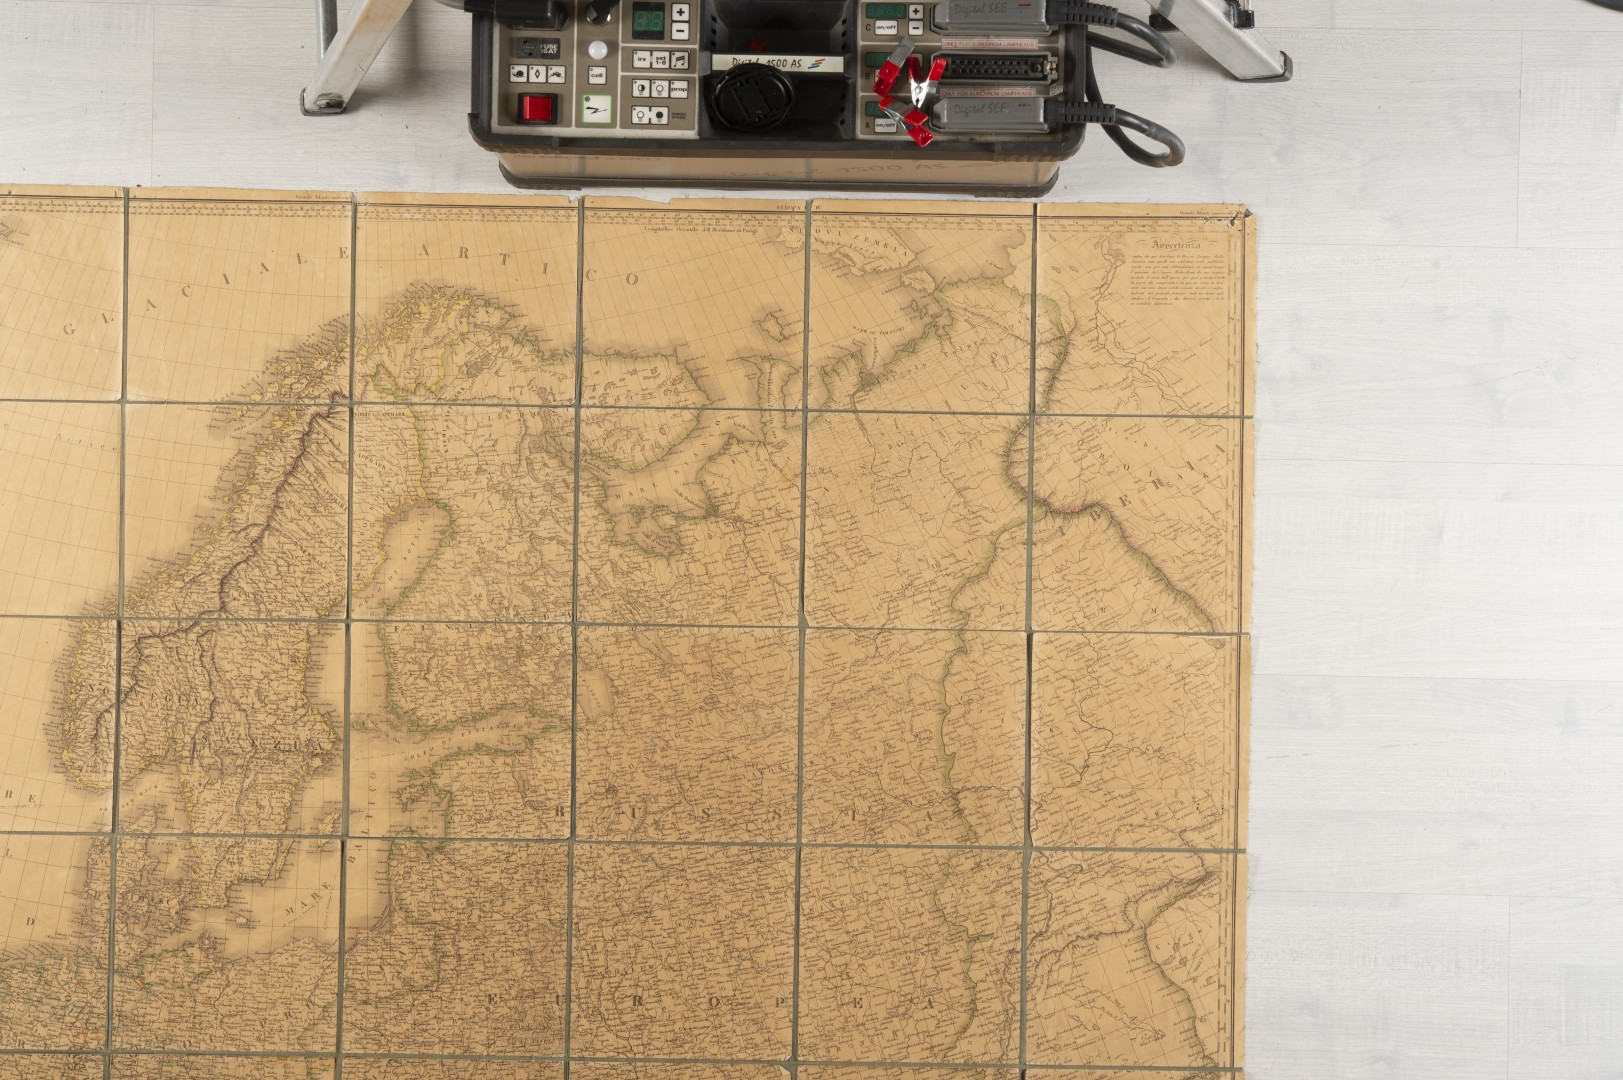 Stucchi, Stanislao Carta geografica statistica e stradale d'Europa. - Image 4 of 8